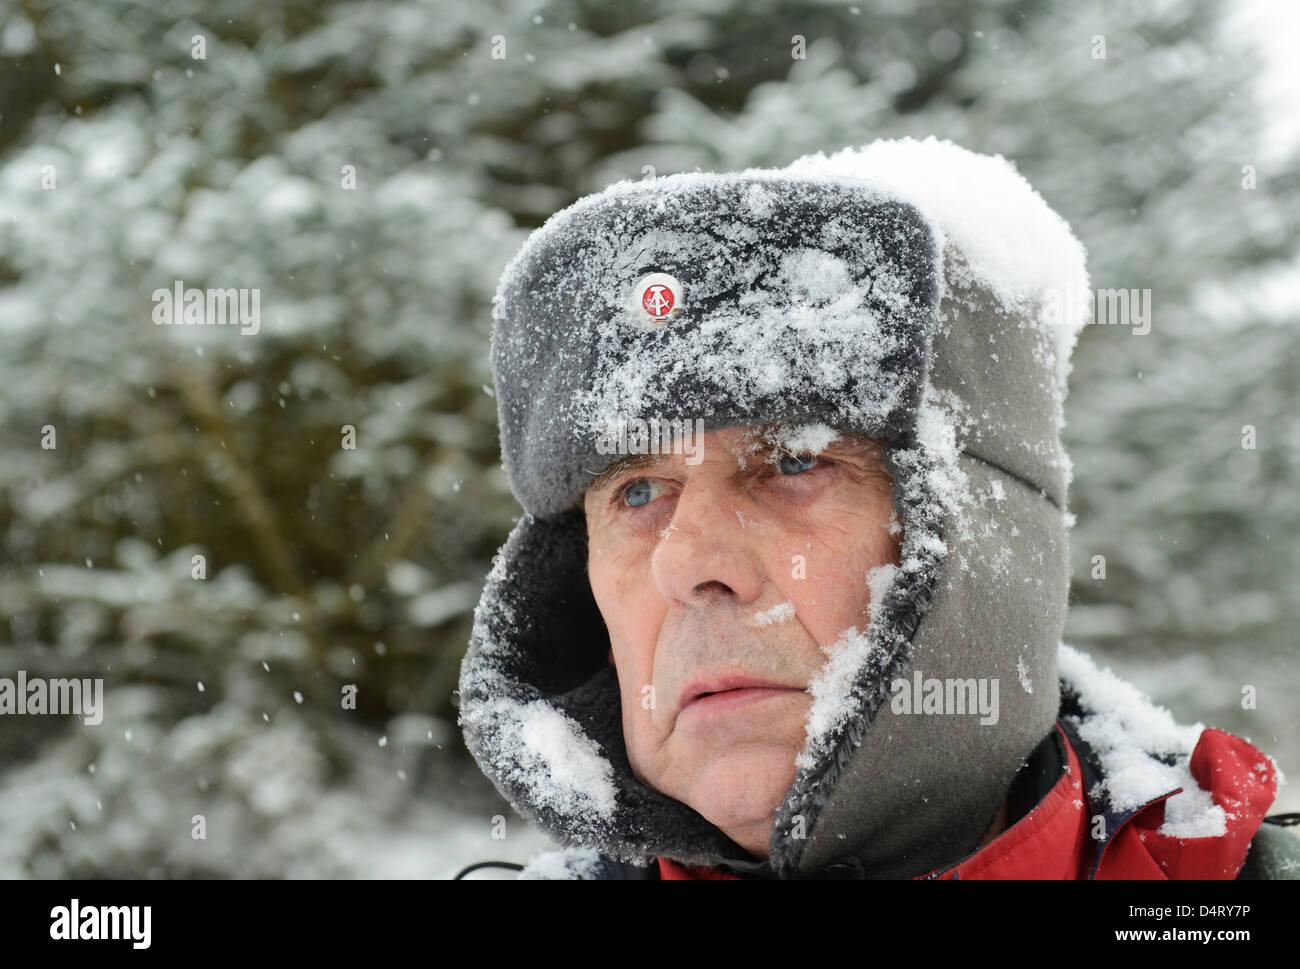 542310e24 Man wearing East German border guard hat Stock Photo: 54616010 - Alamy